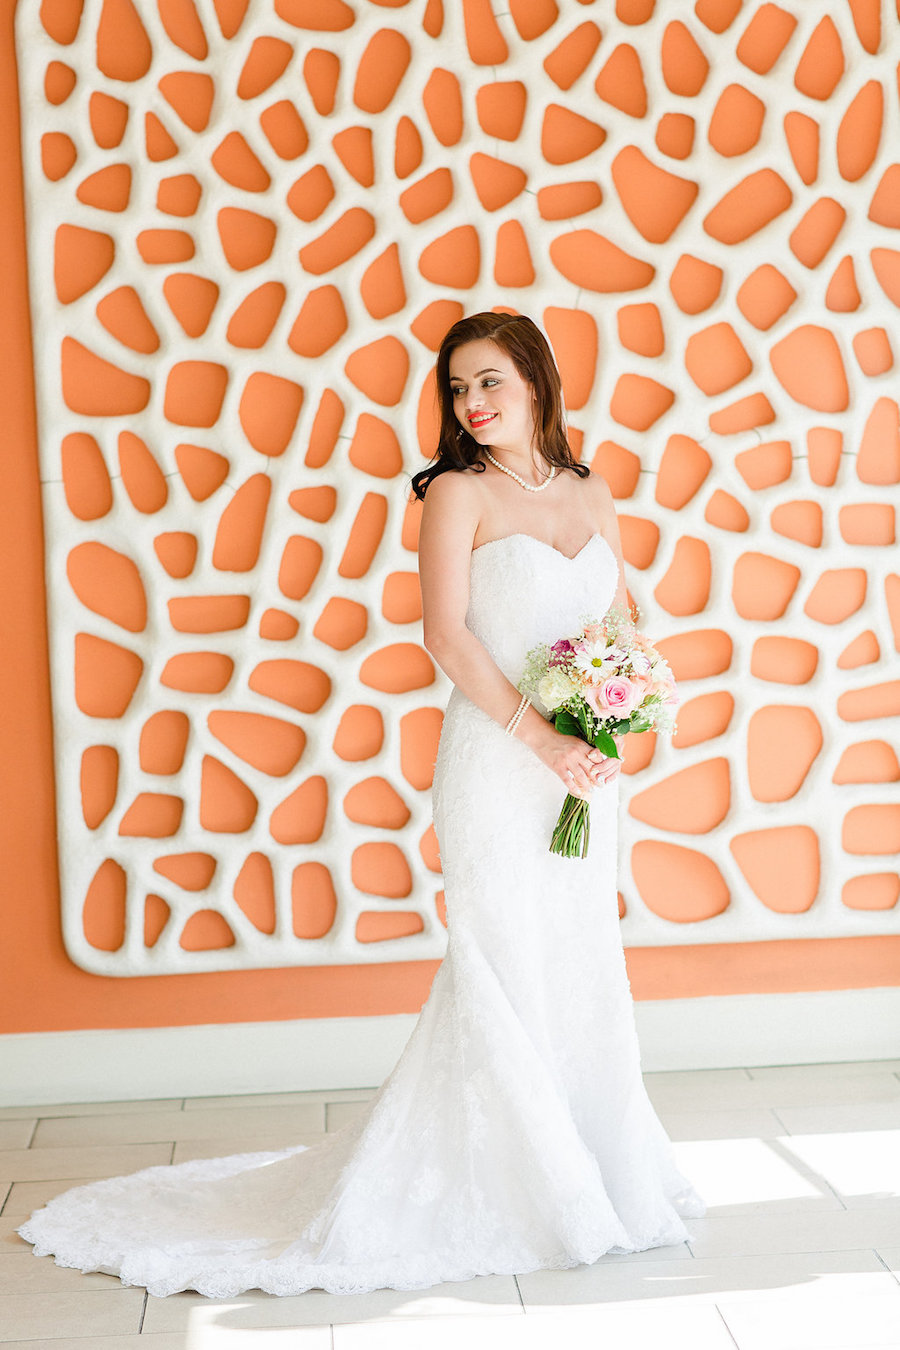 Outdoor, Bridal Wedding Portrait in White Strapless Demetrios Wedding Dress | Clearwater Beach Wedding Photographer Ailyn La Torre Photography